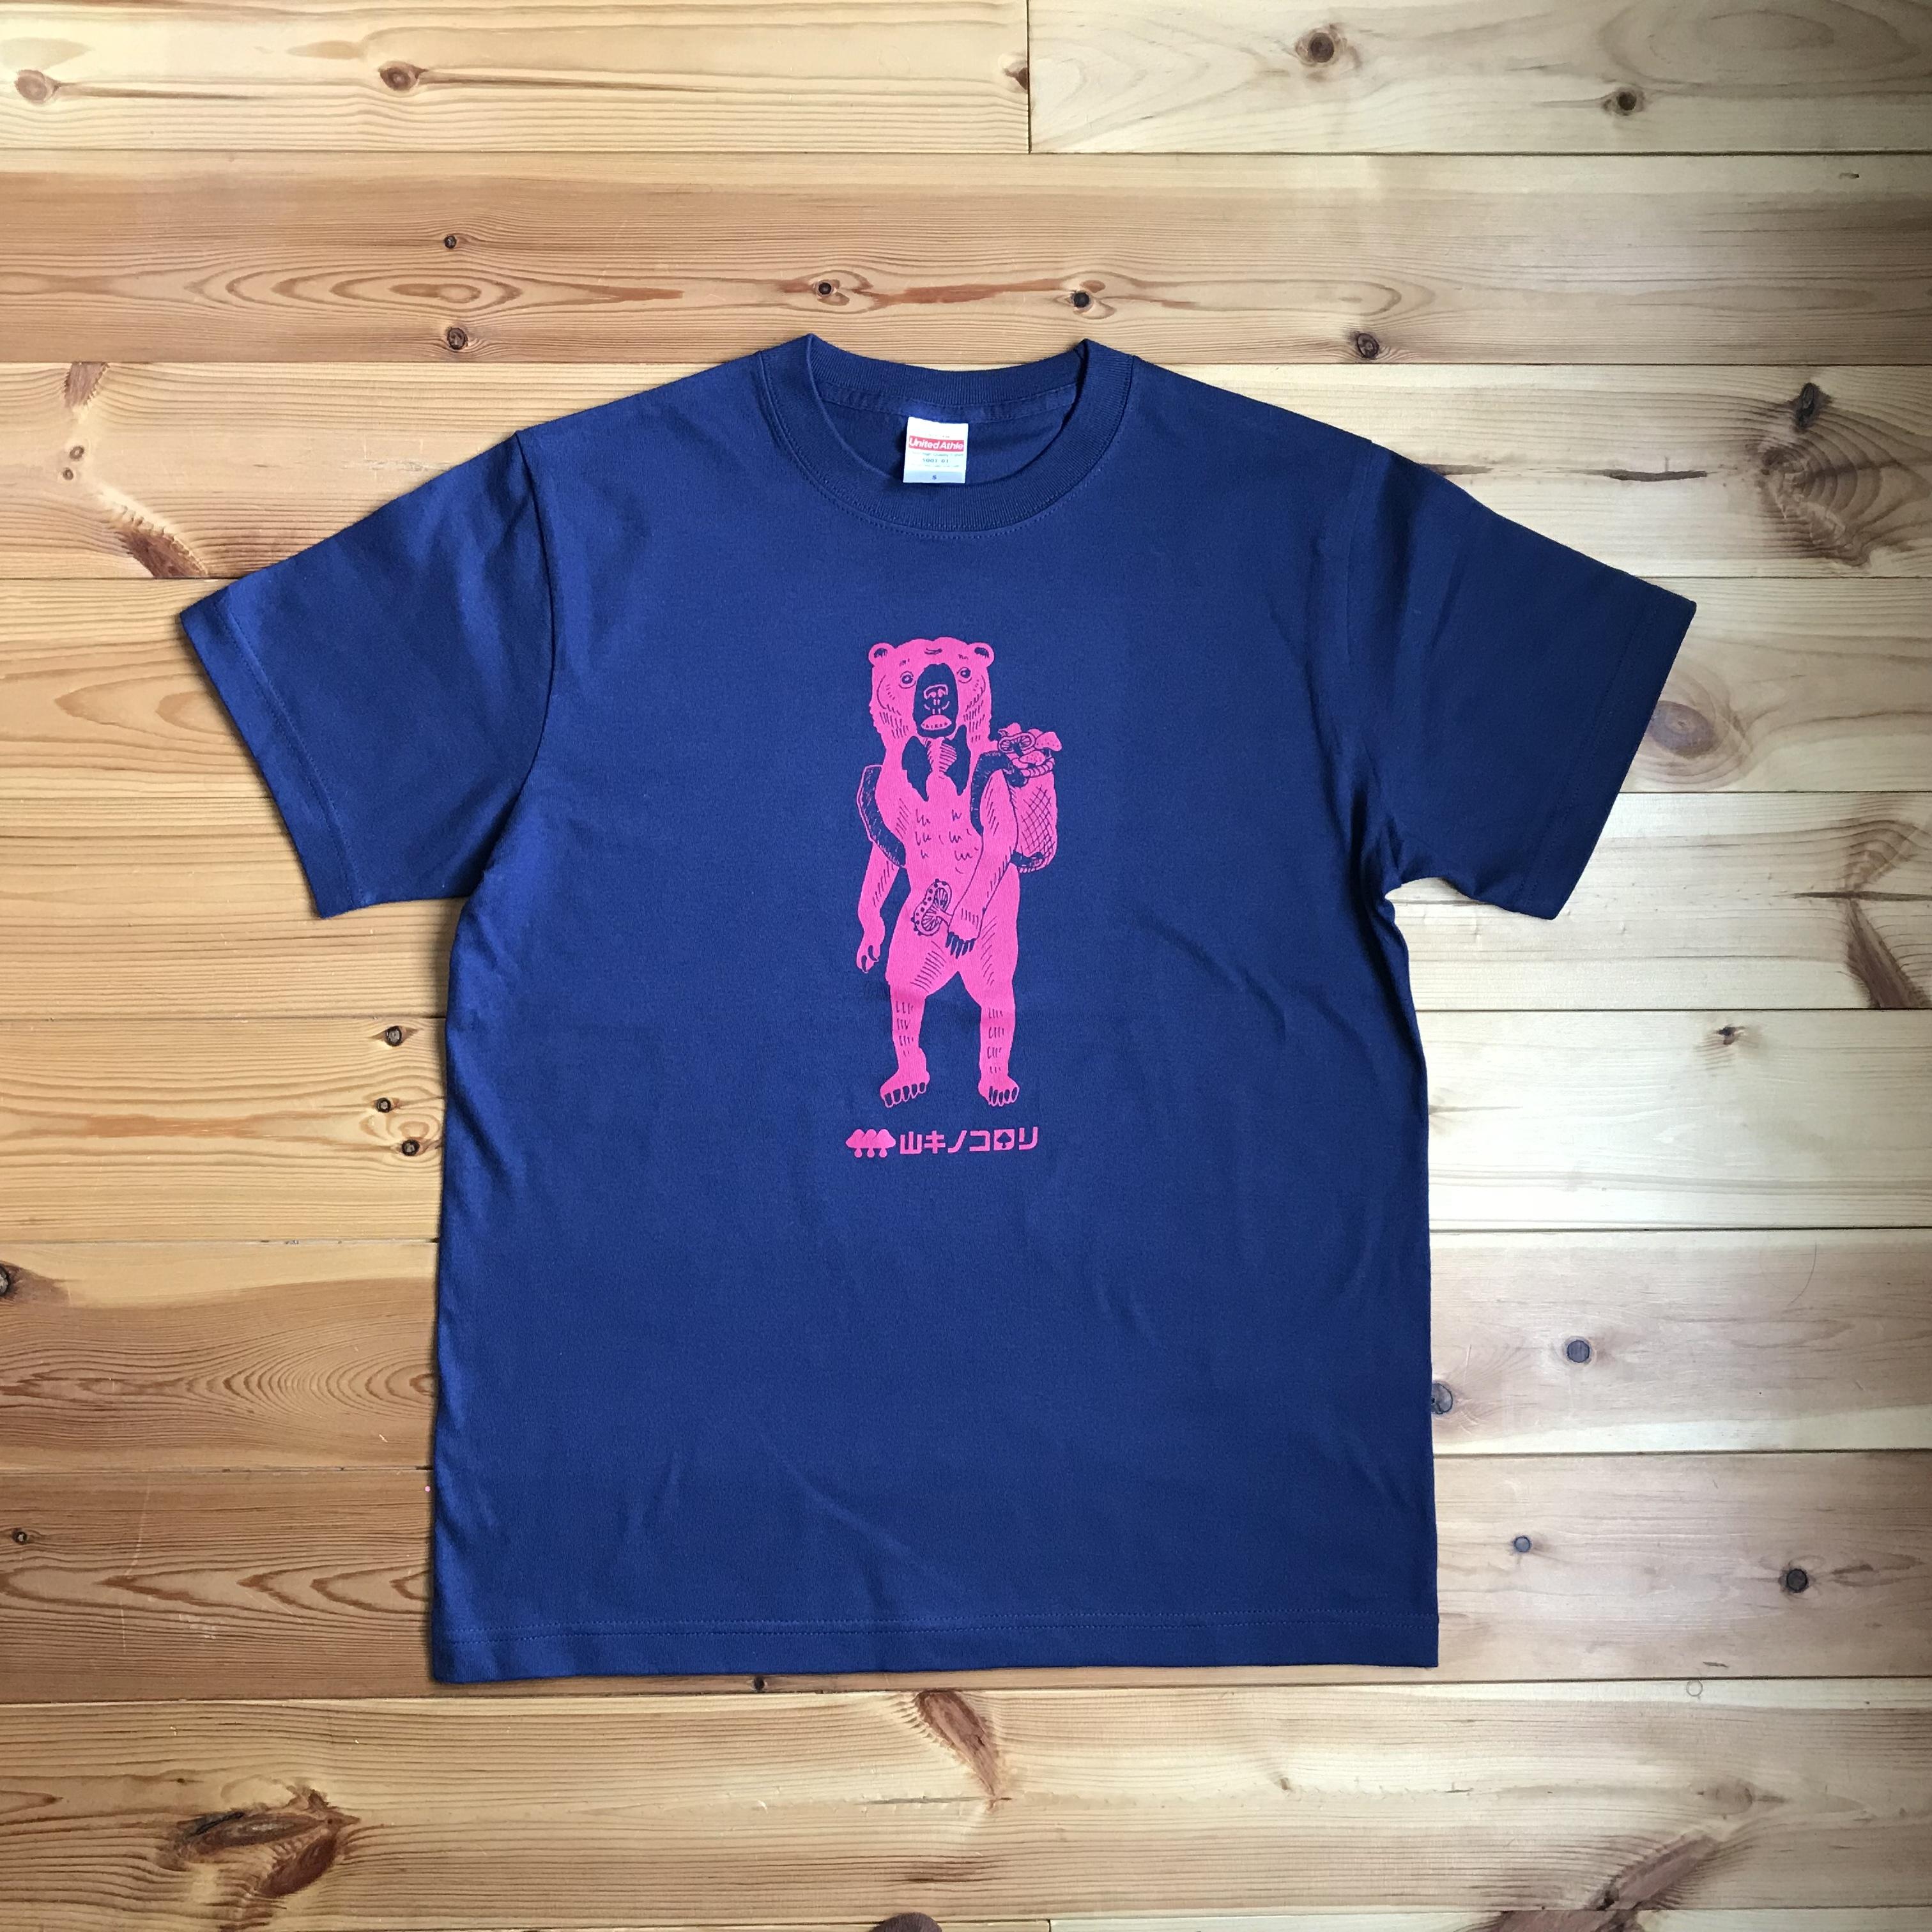 【Tシャツ(大人サイズ)】キノコ狩りをするマレーグマ(インディゴ×ピンク)